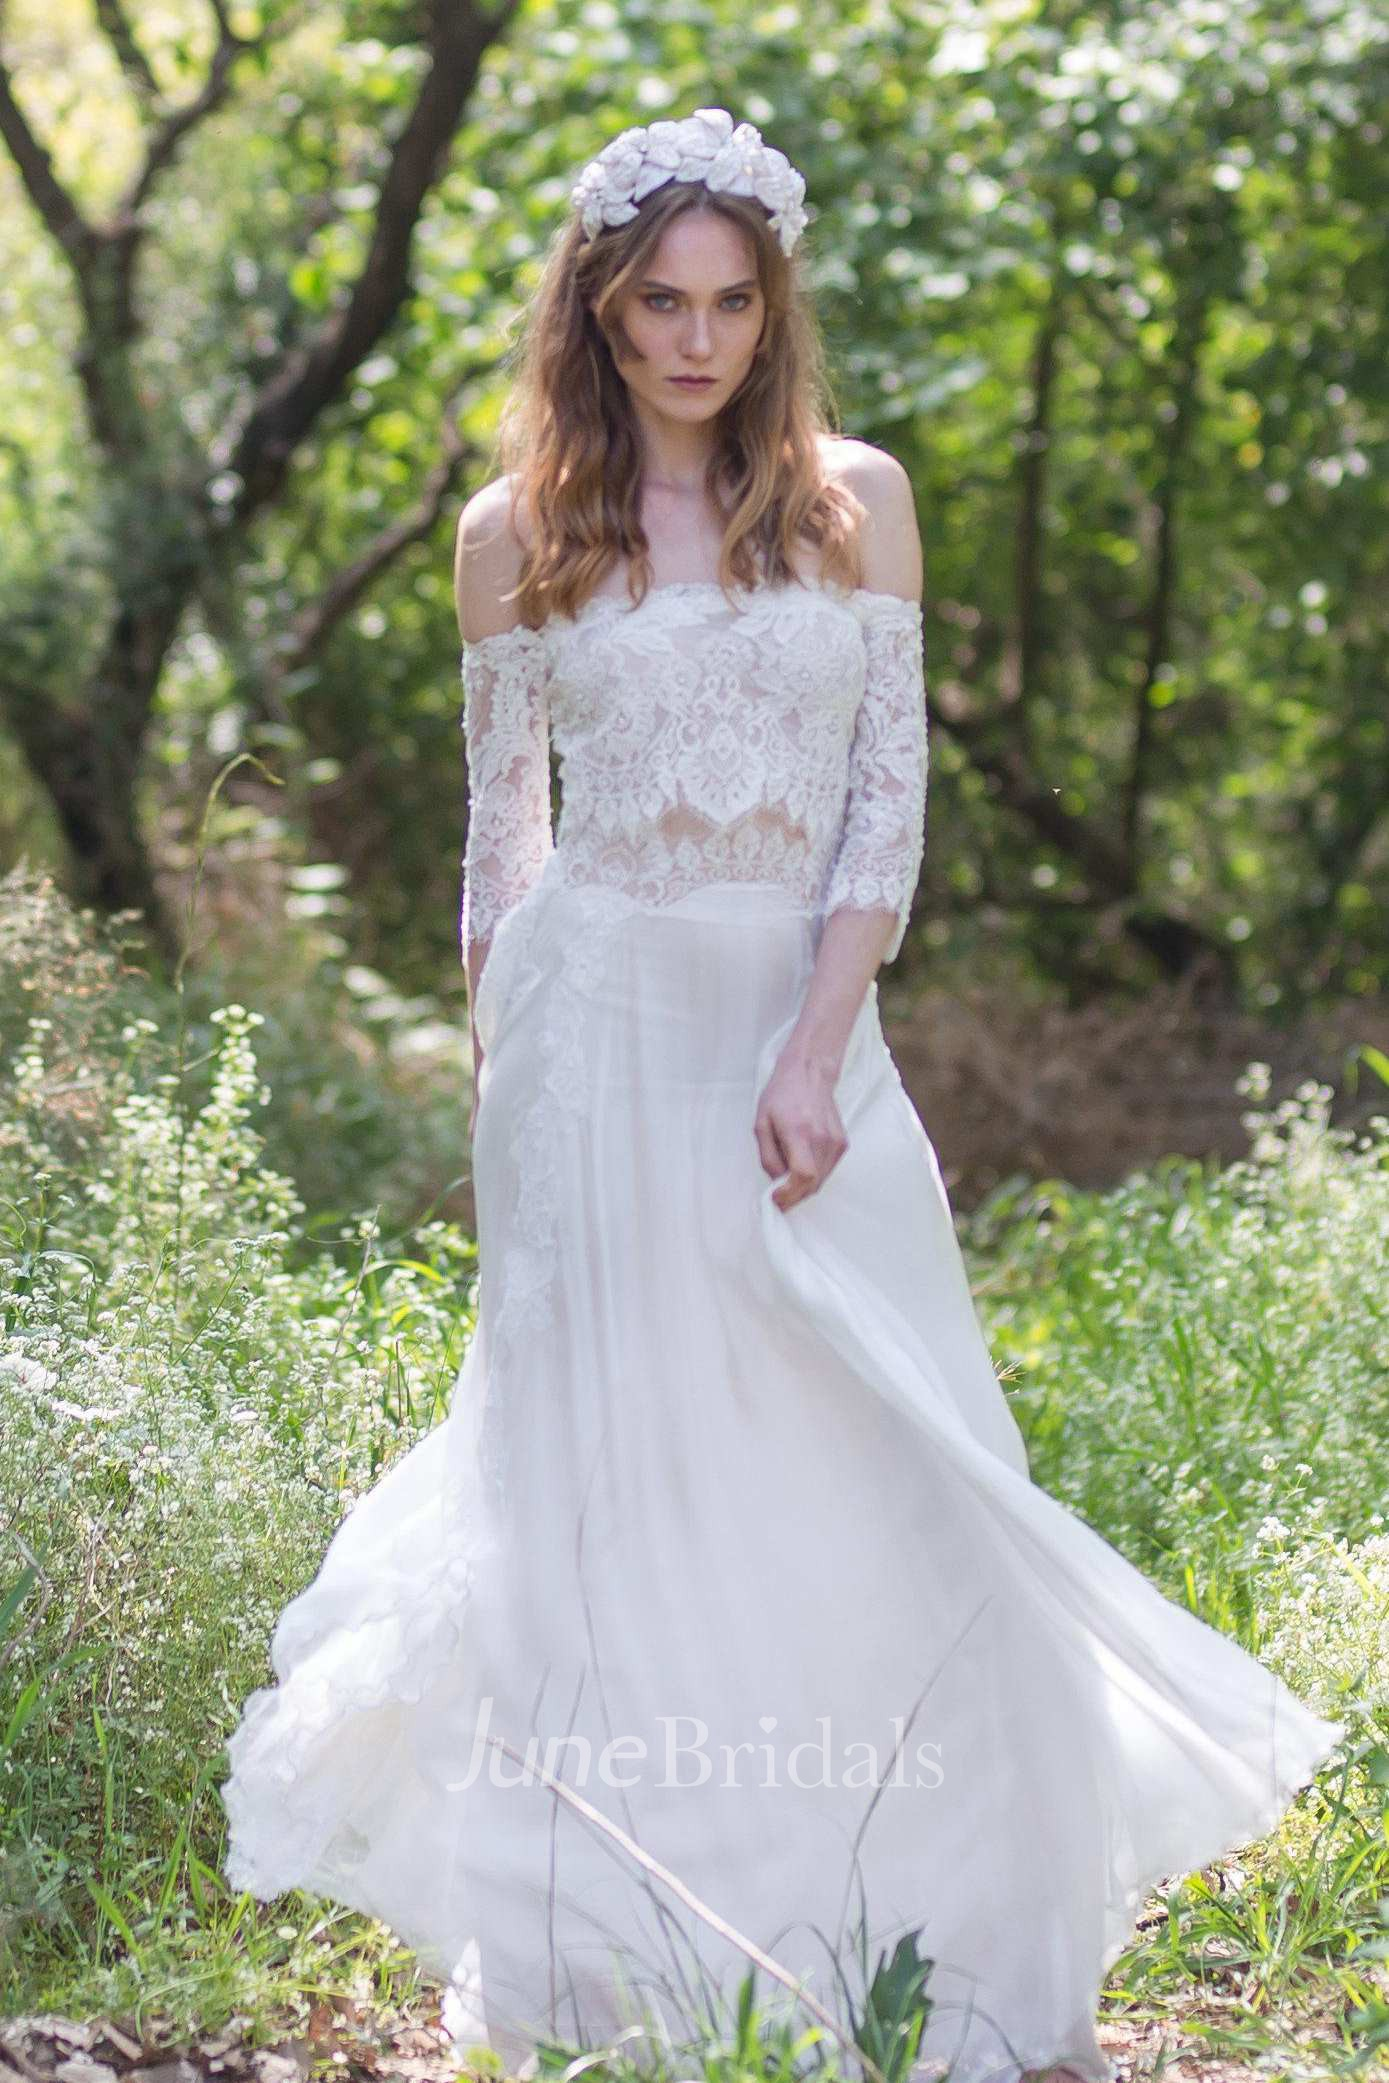 f the shoulder Lace Chiffon Boho Wedding Dress With